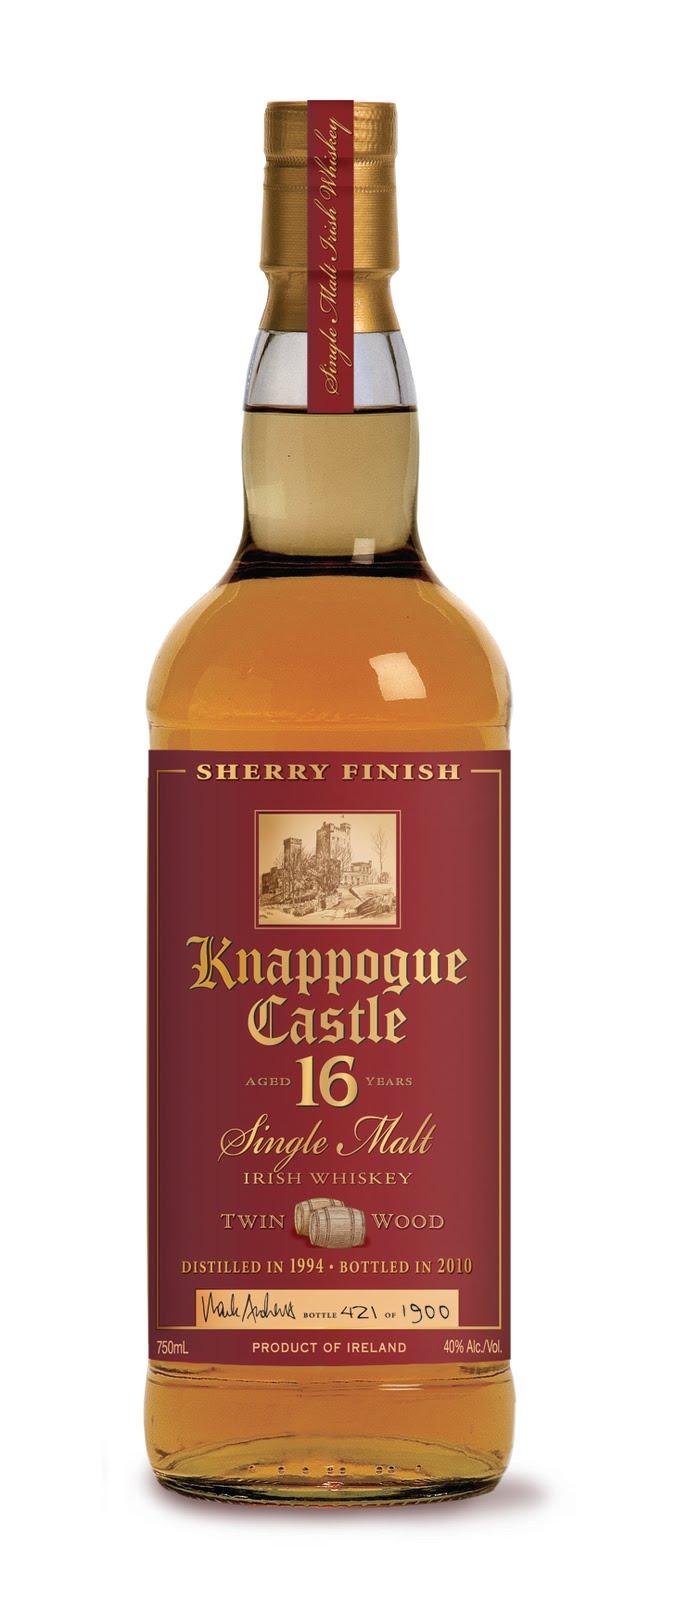 Knappogue Castle Twin Wood Single Malt Irish Whiskey16 Years Old (2014)